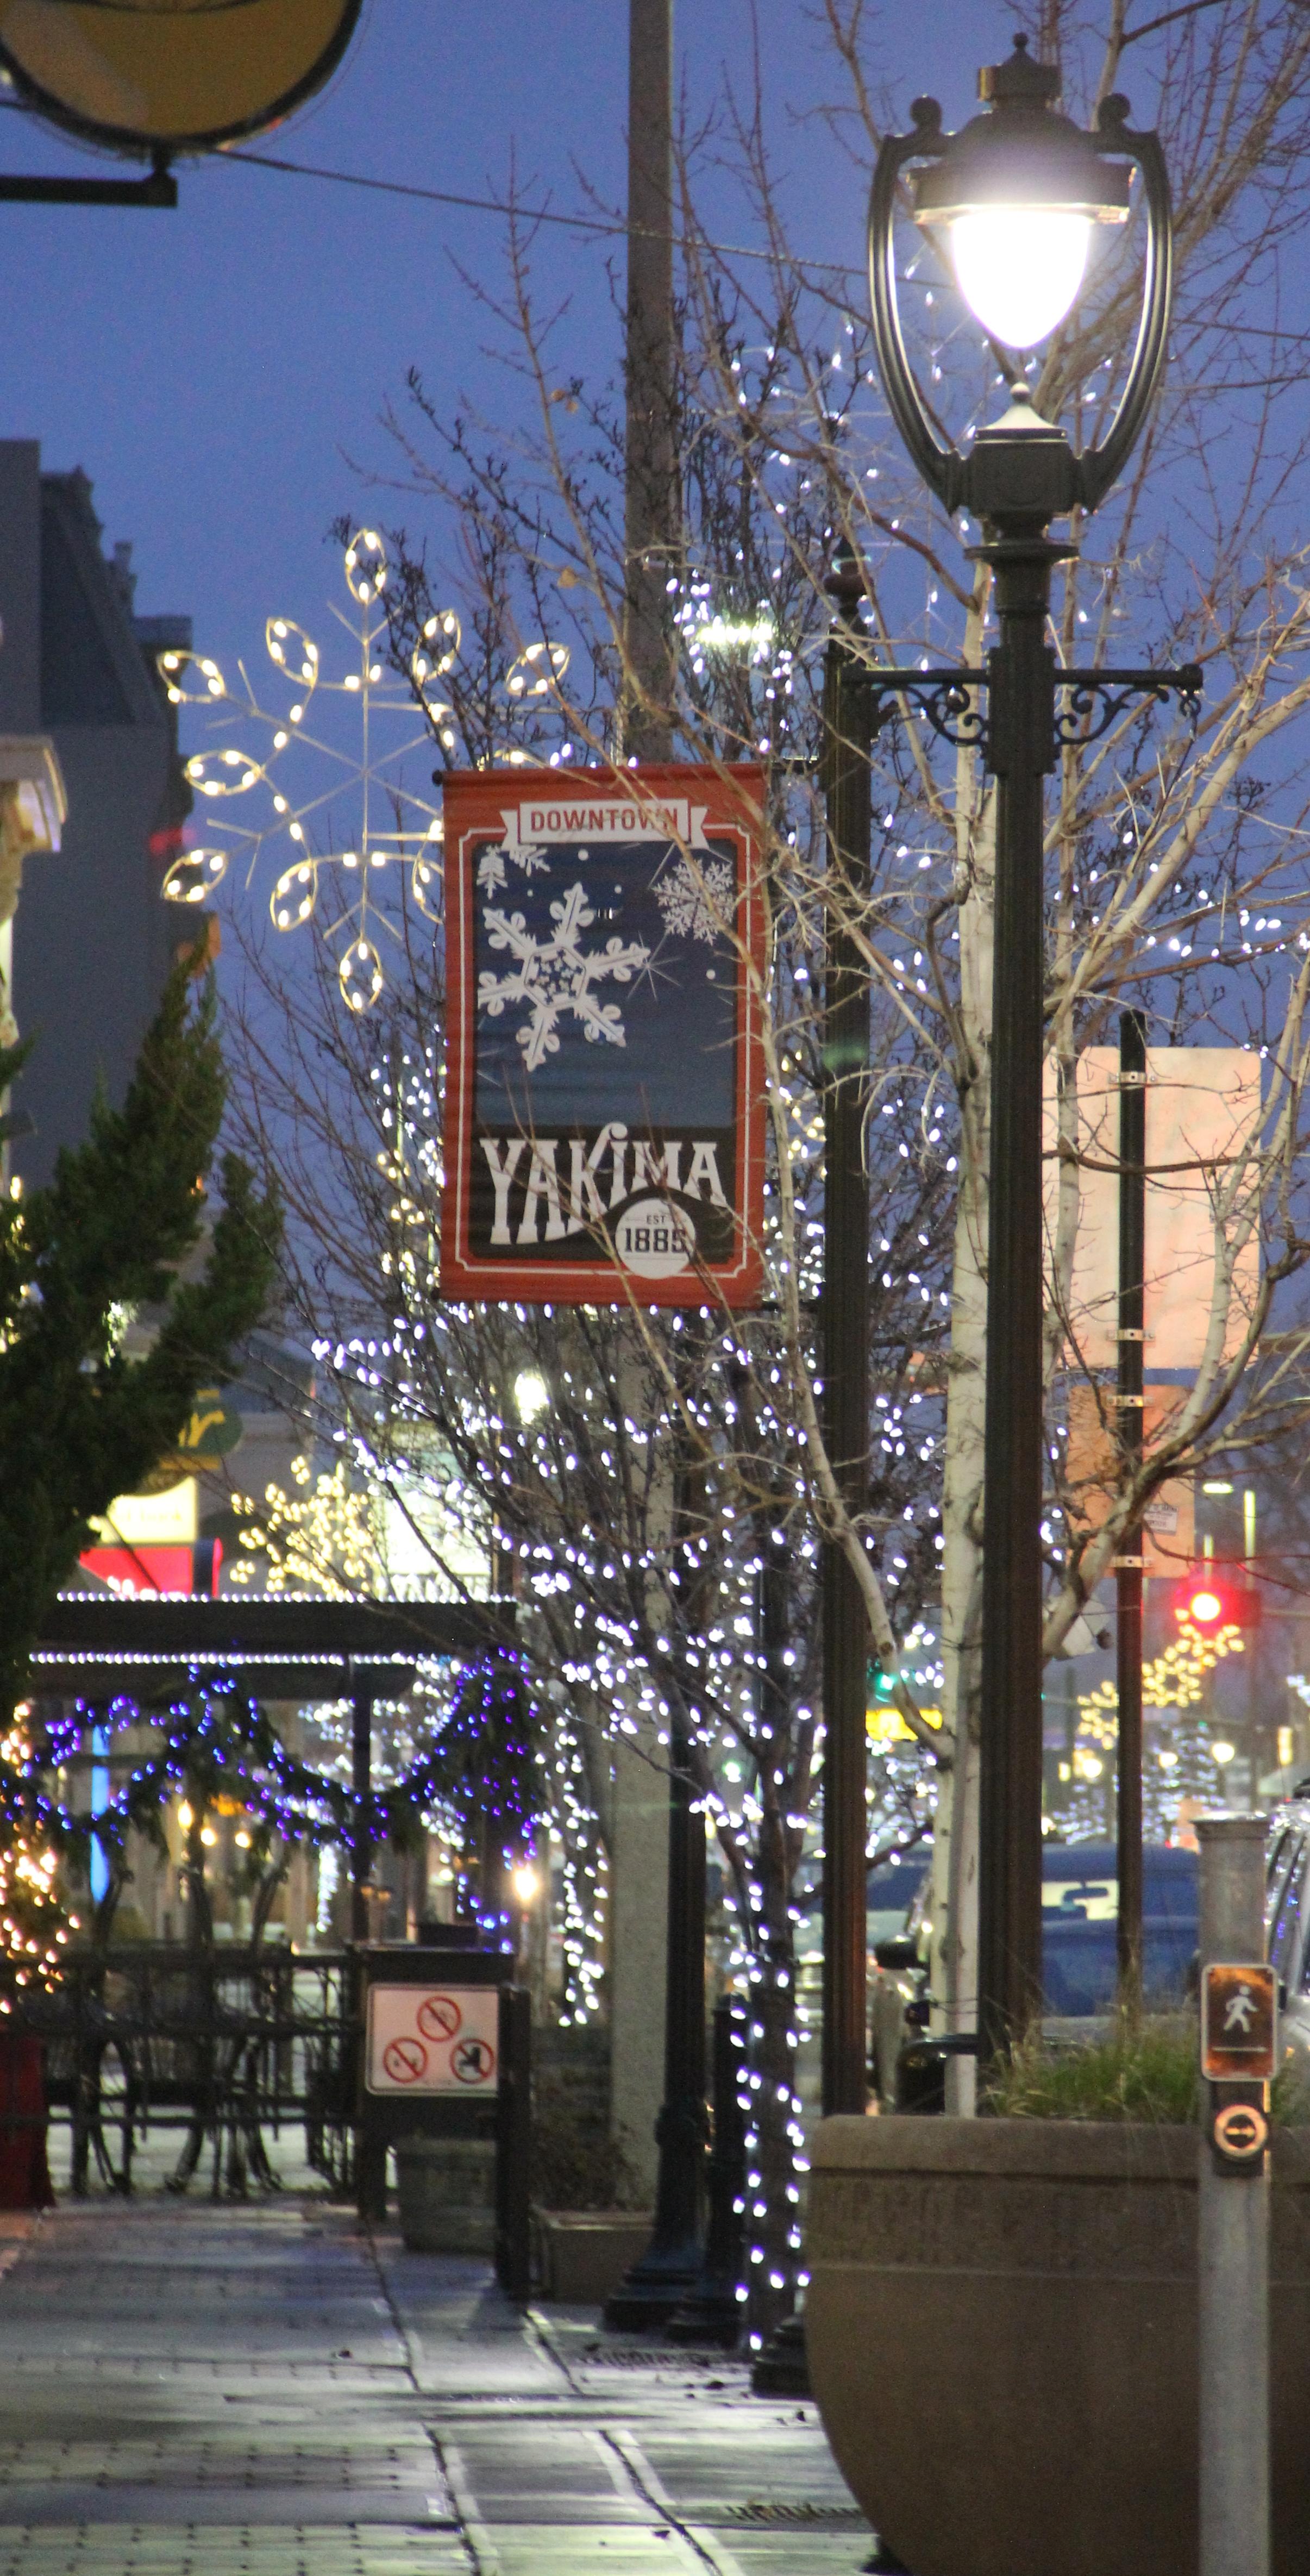 Yakima Christmas Lights Map 2020 Photo of the Week – Light Christmas  12 24 14   Photo of the Week